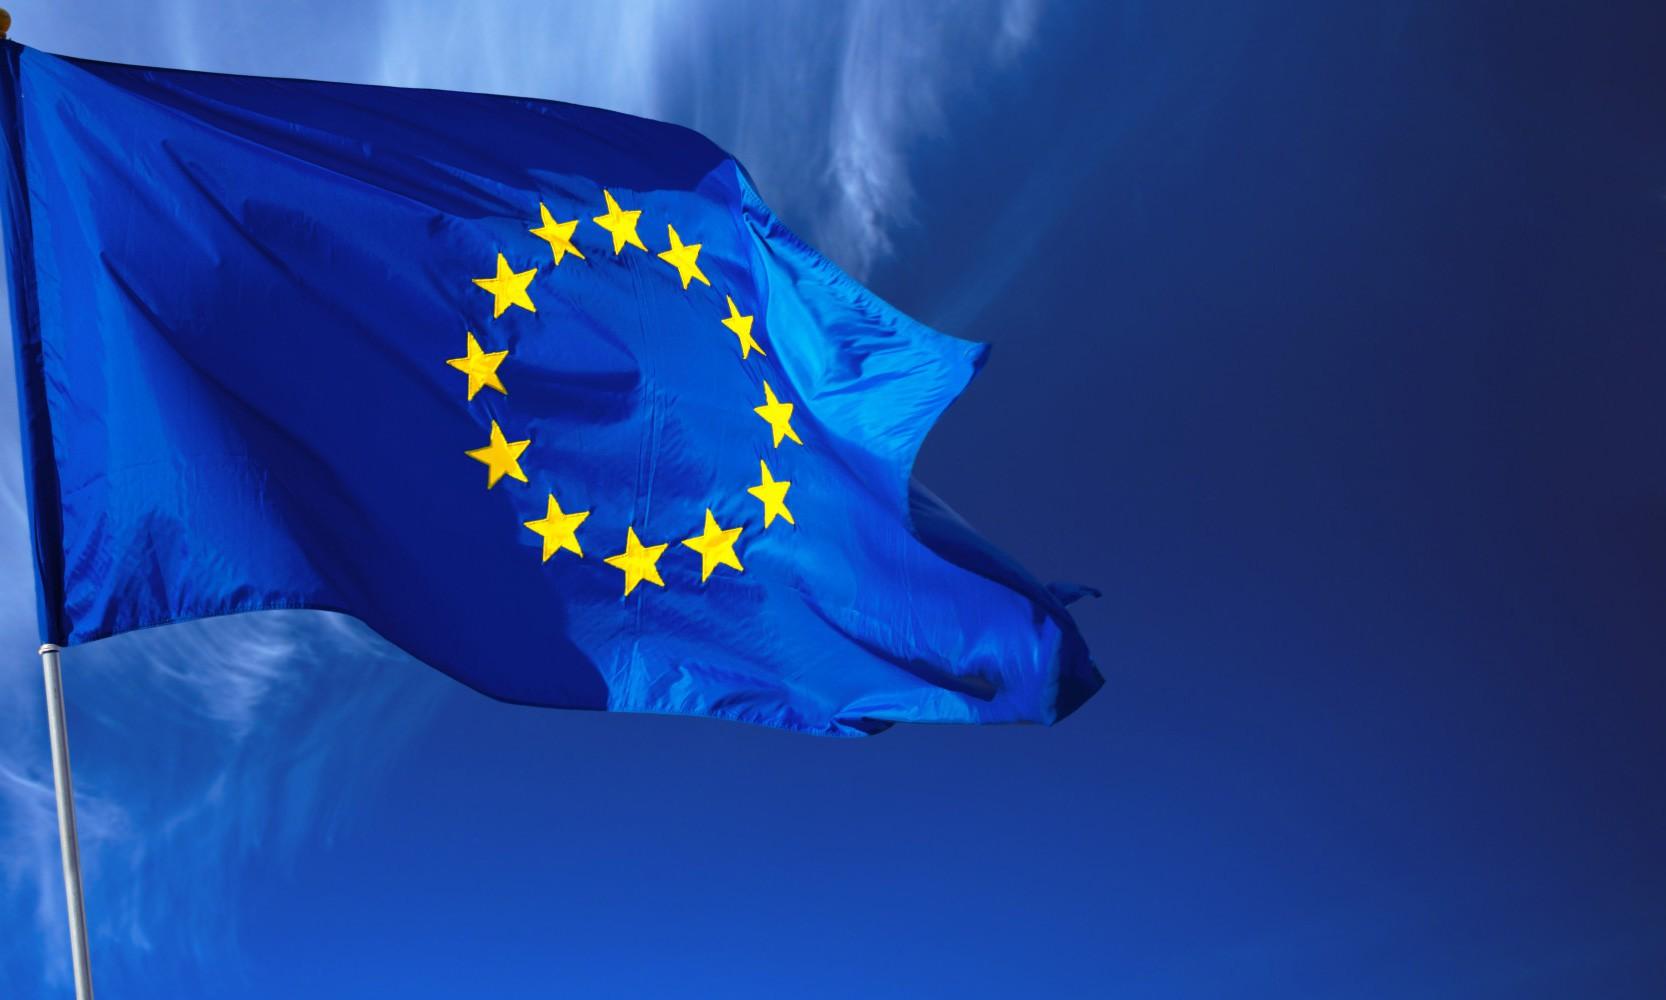 EU has alternatives in the Western Balkans